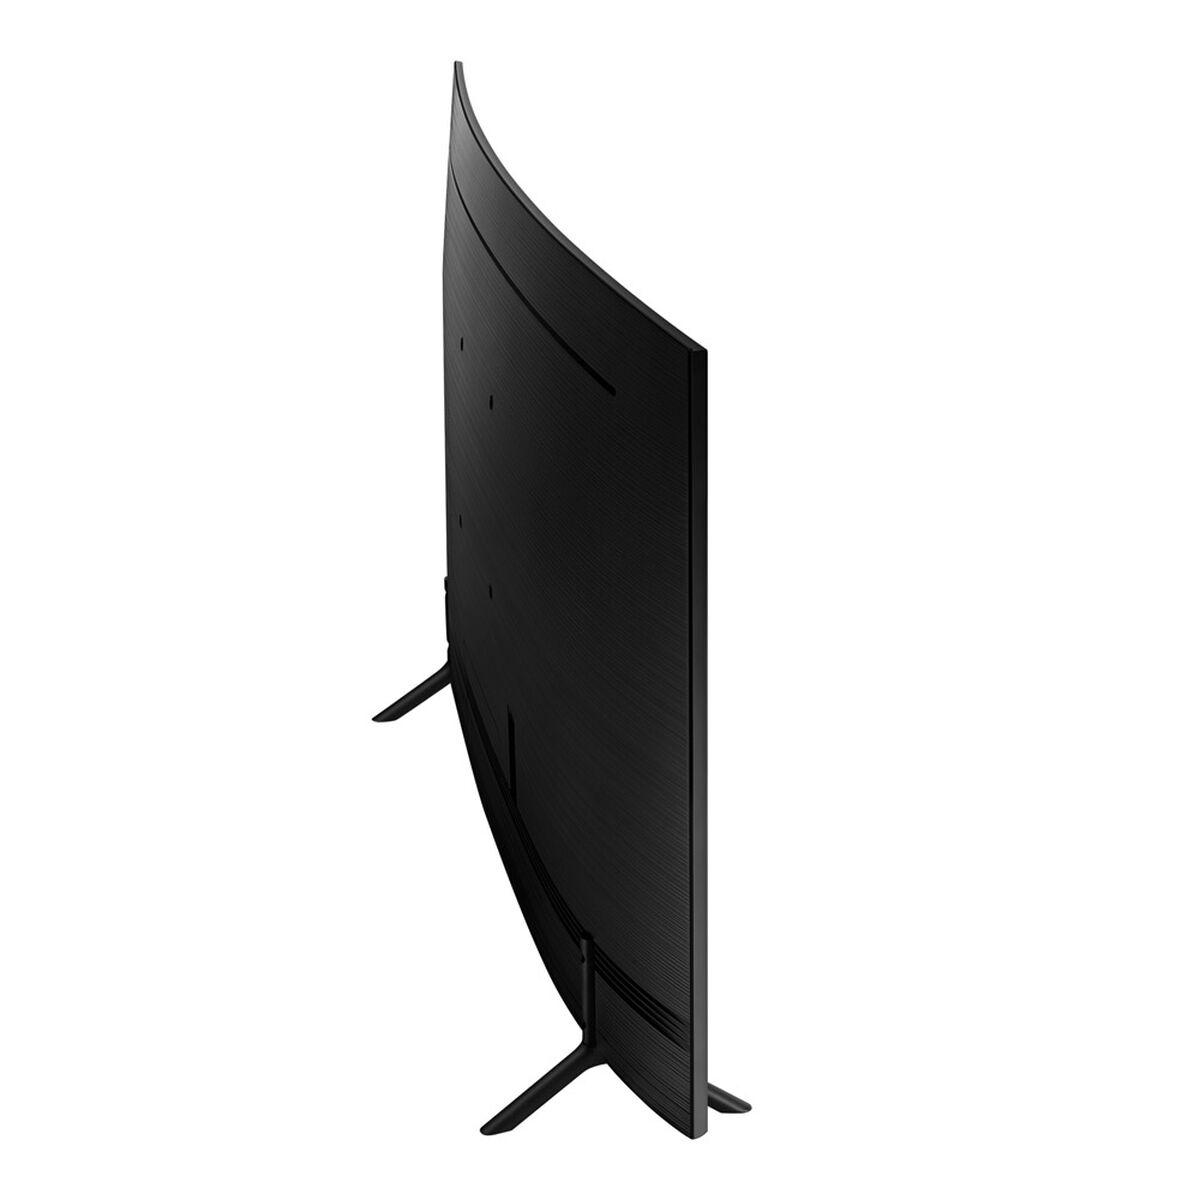 "LED Curvo 55"" Samsung URU7300 Smart TV 4K UHD"